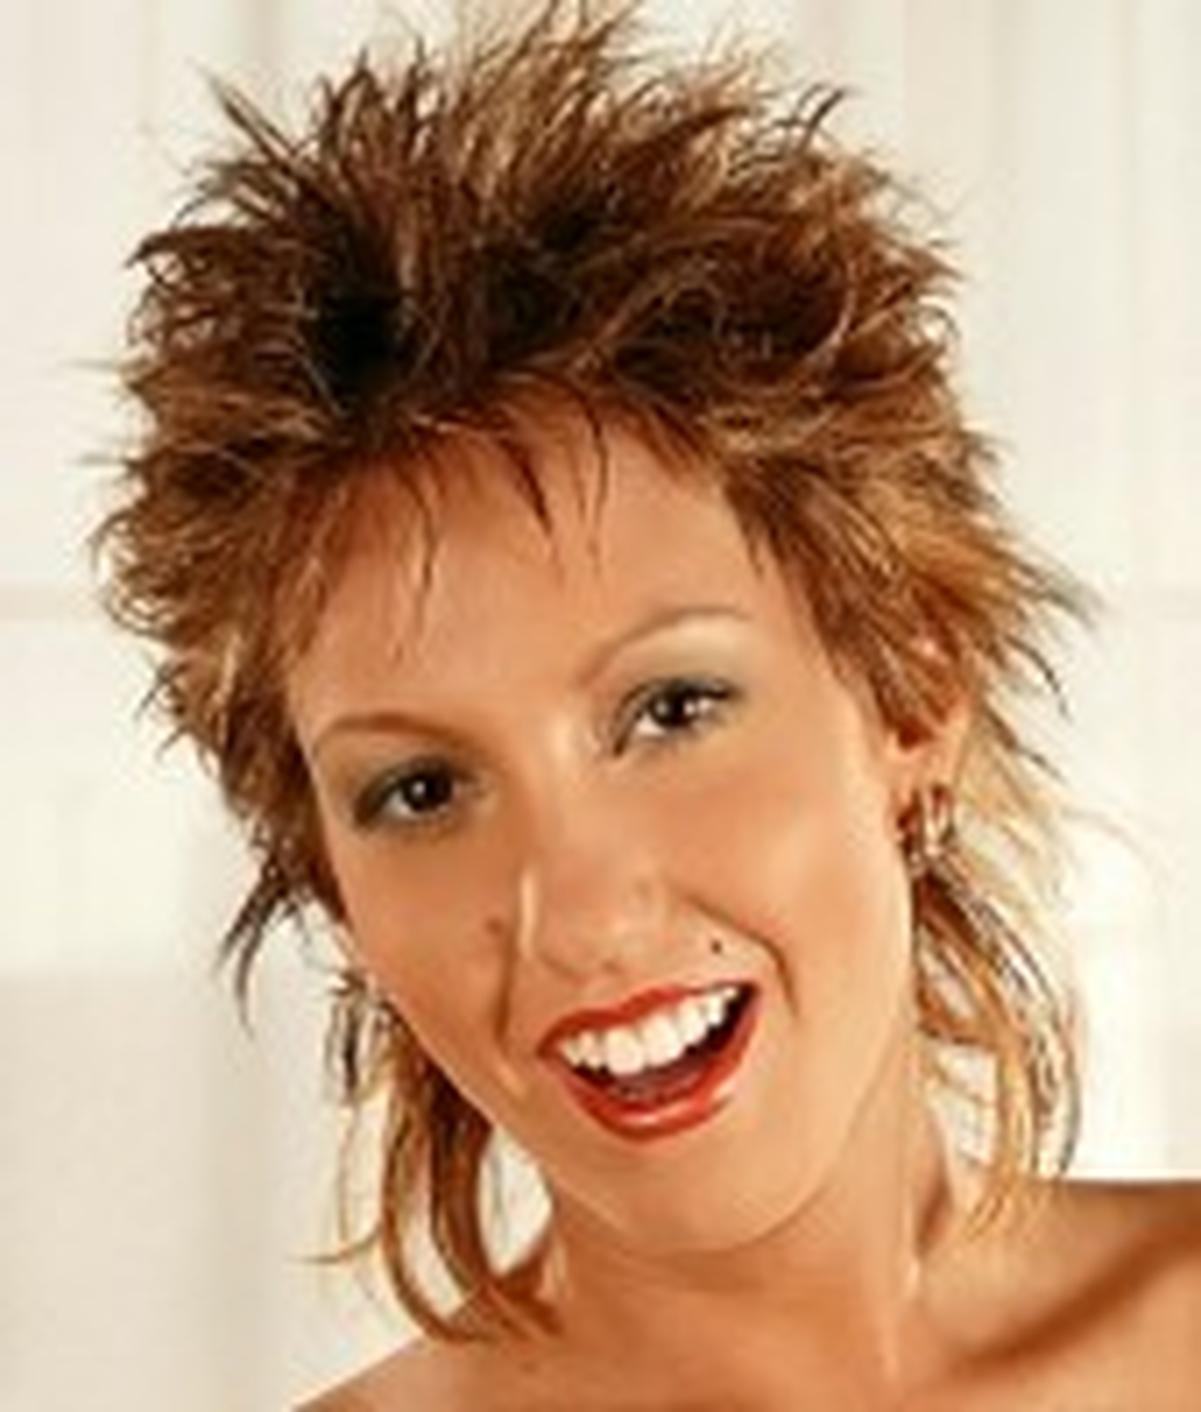 Sonja Beluga